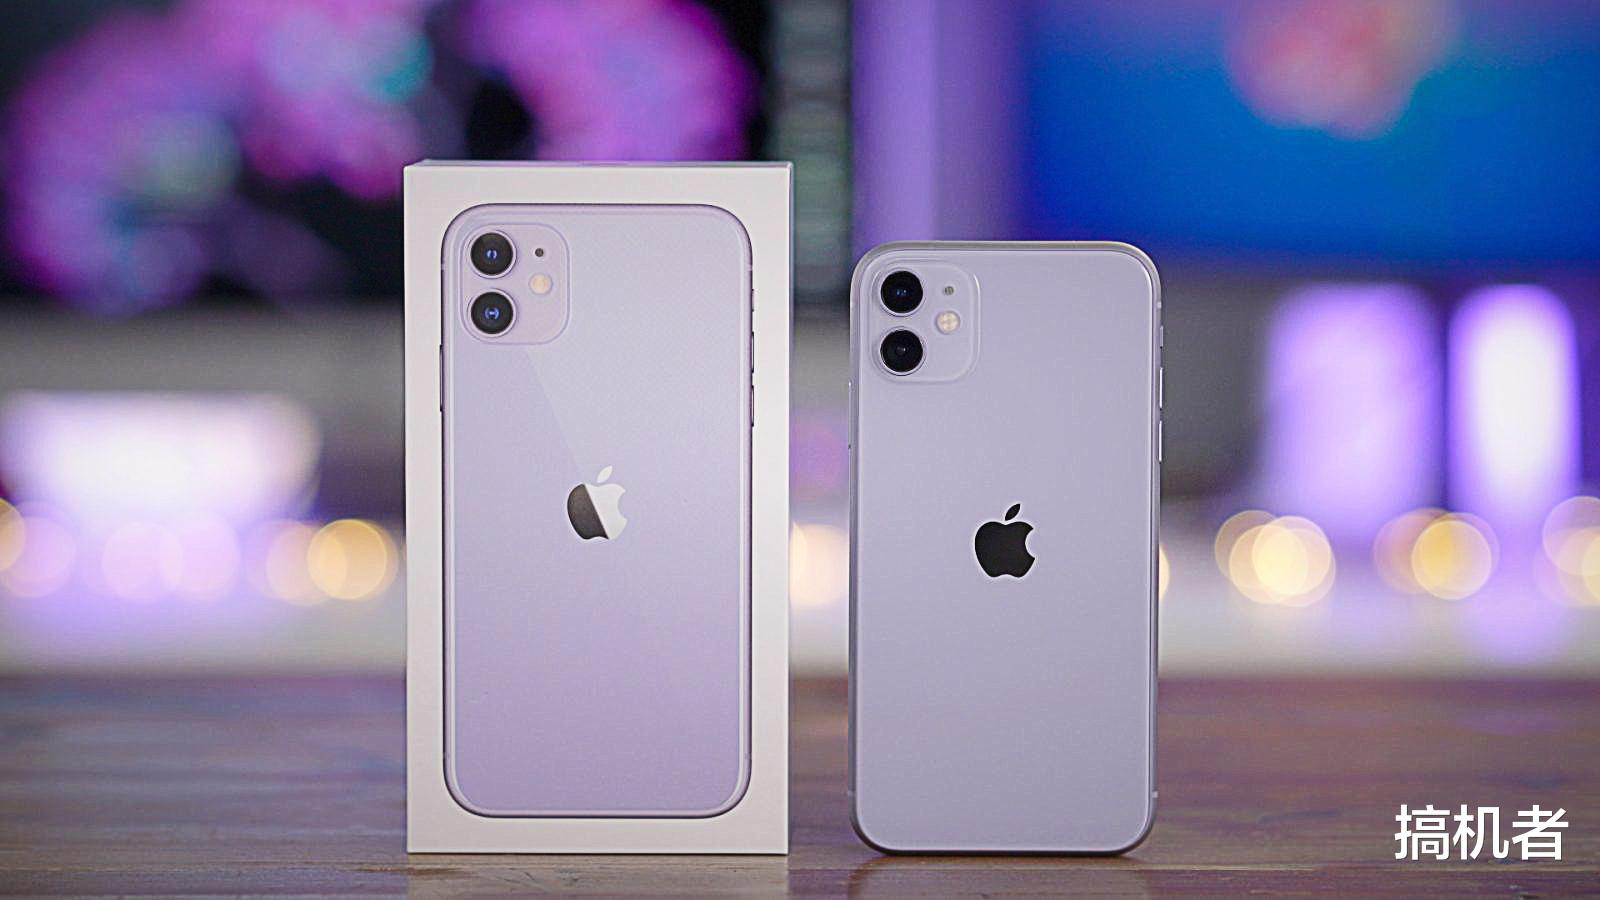 Iphone11 容量